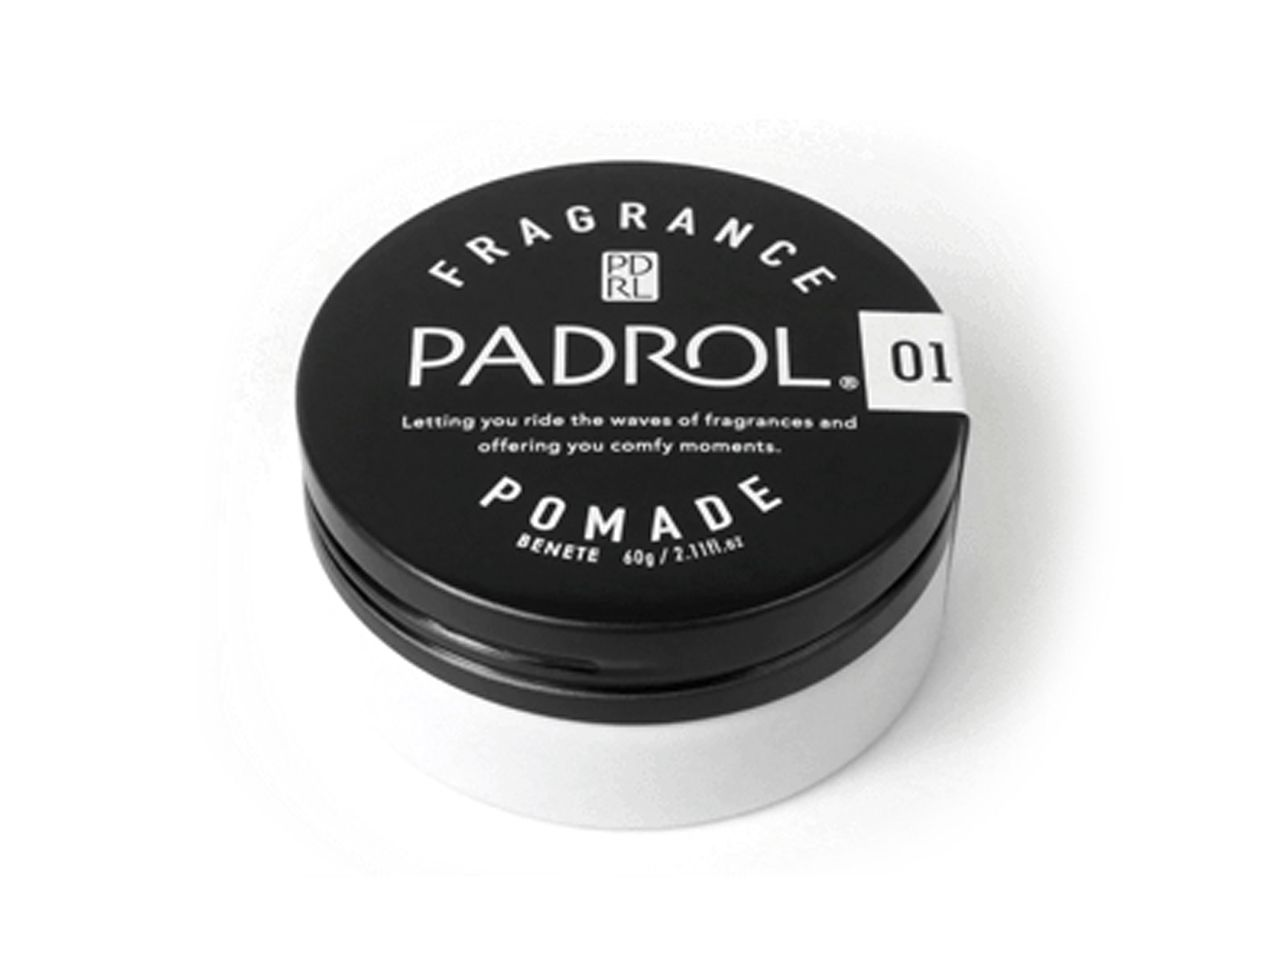 PADROL Fragrance Pomade